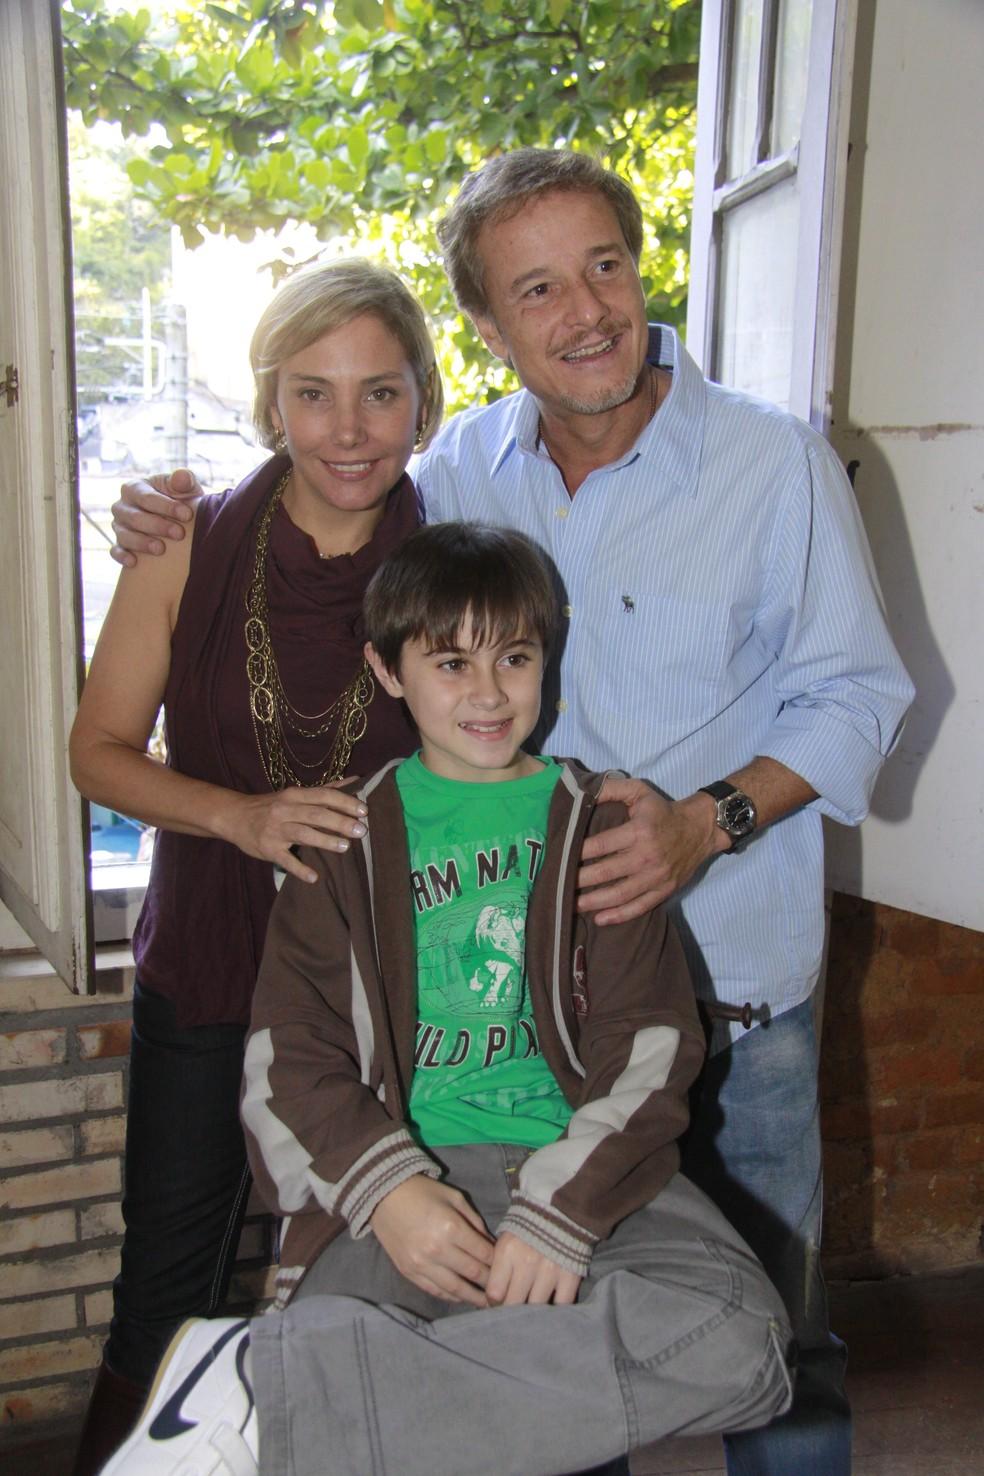 Rafael Miguel deu vida ao personagem Juca, na novela 'Cama de Gato', filho de Taís (Heloísa Perisse) e Bené (Marcello Novaes) — Foto: Isac Luz/TV Globo